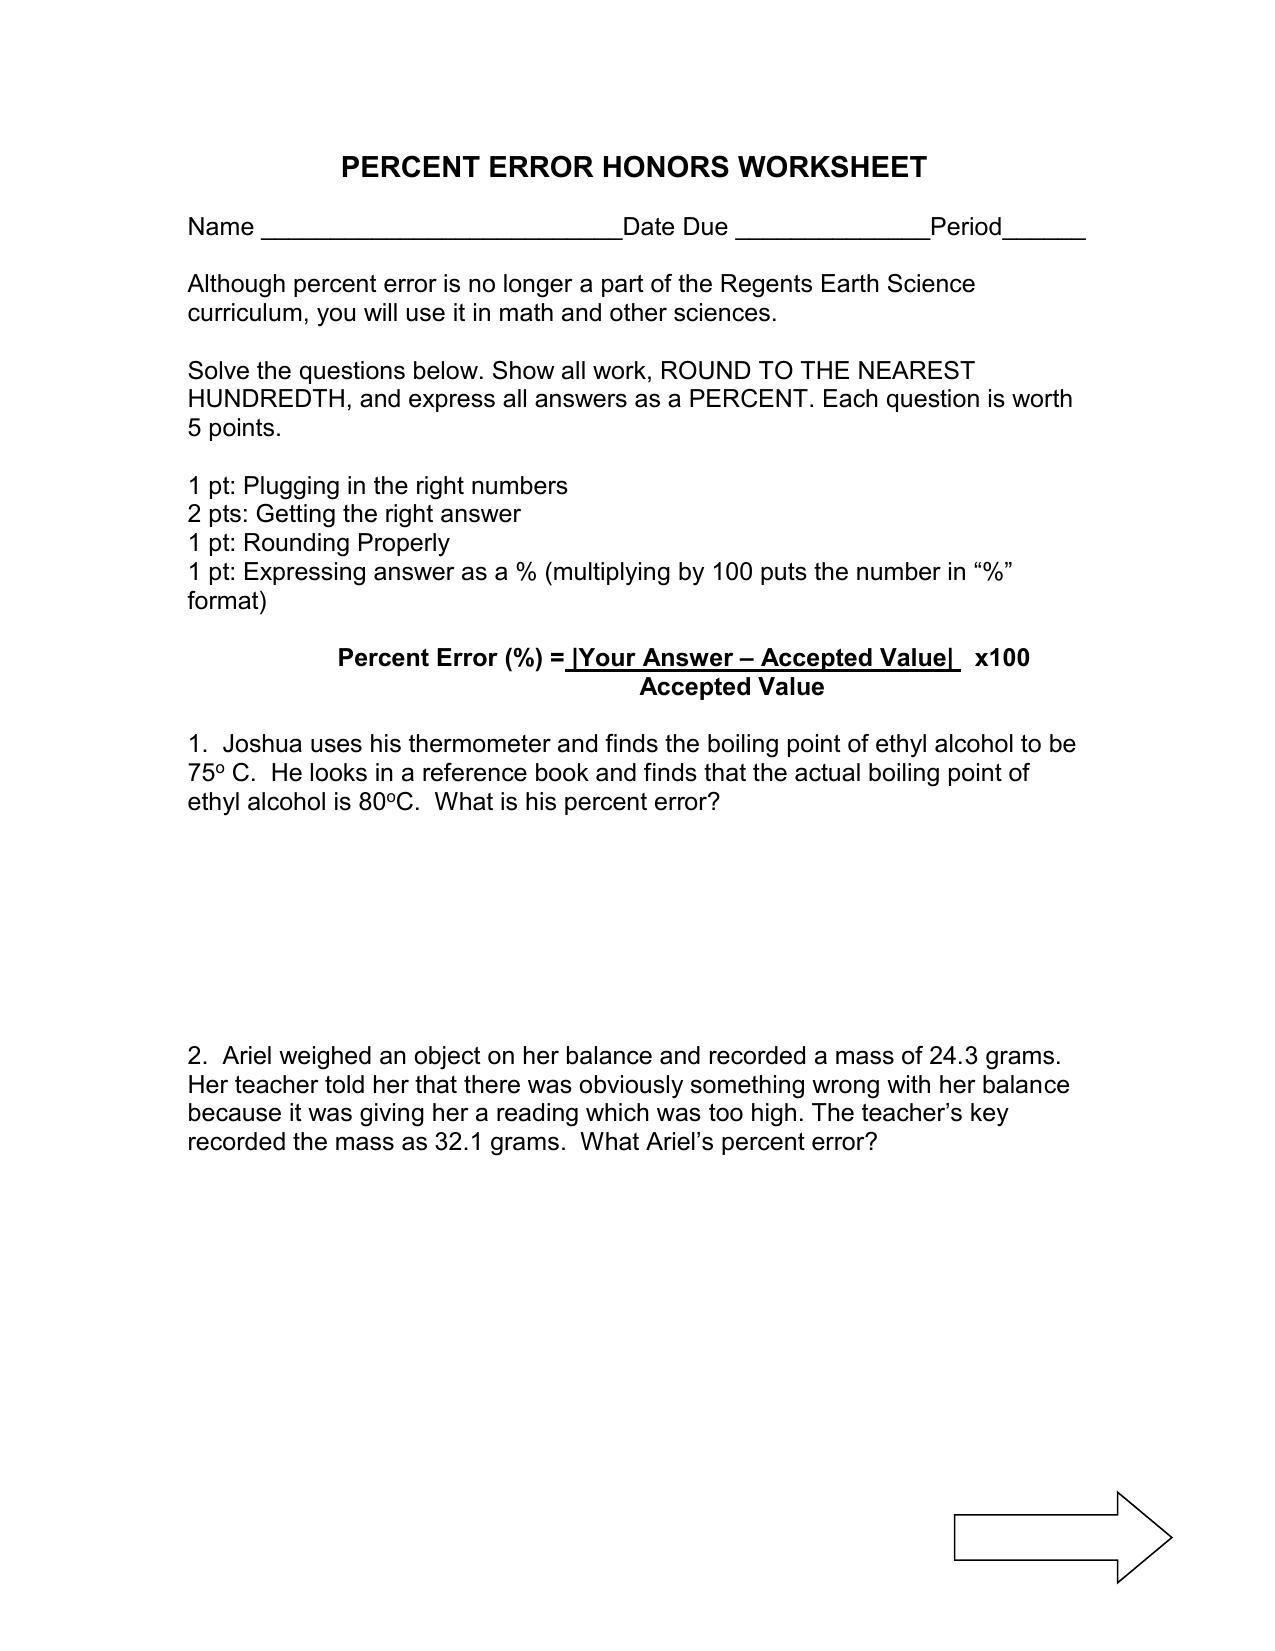 Percent Error Worksheet Option 25 With Percent Error Worksheet Answer Key